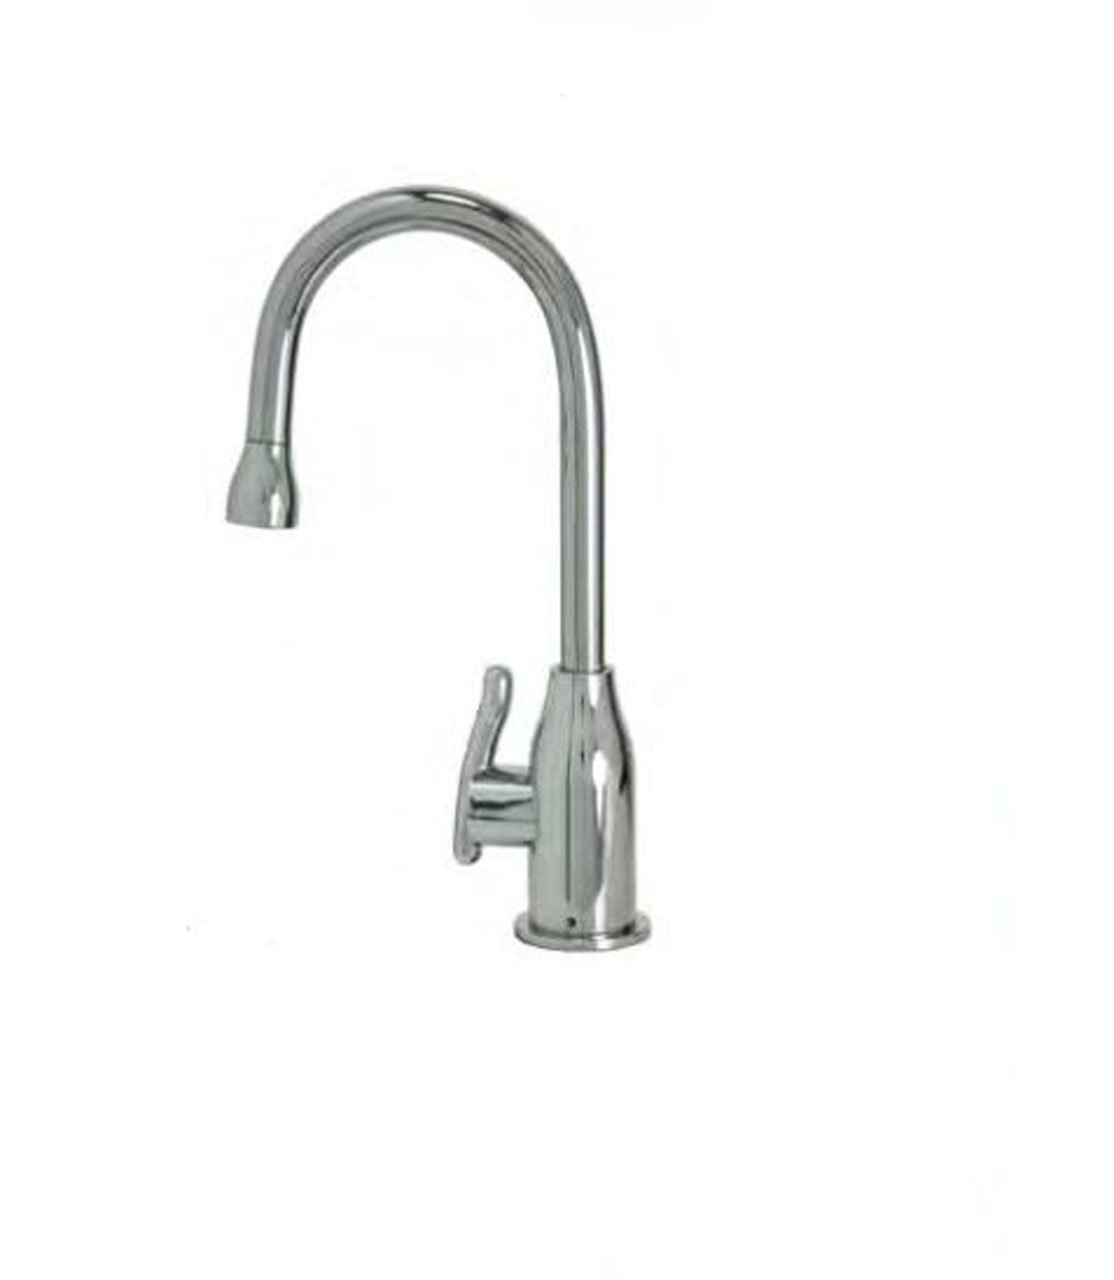 Mountain Plumbing MT1800-NL/PVDPN Little Gourmet Hot Water Dispenser, Polished Nickel